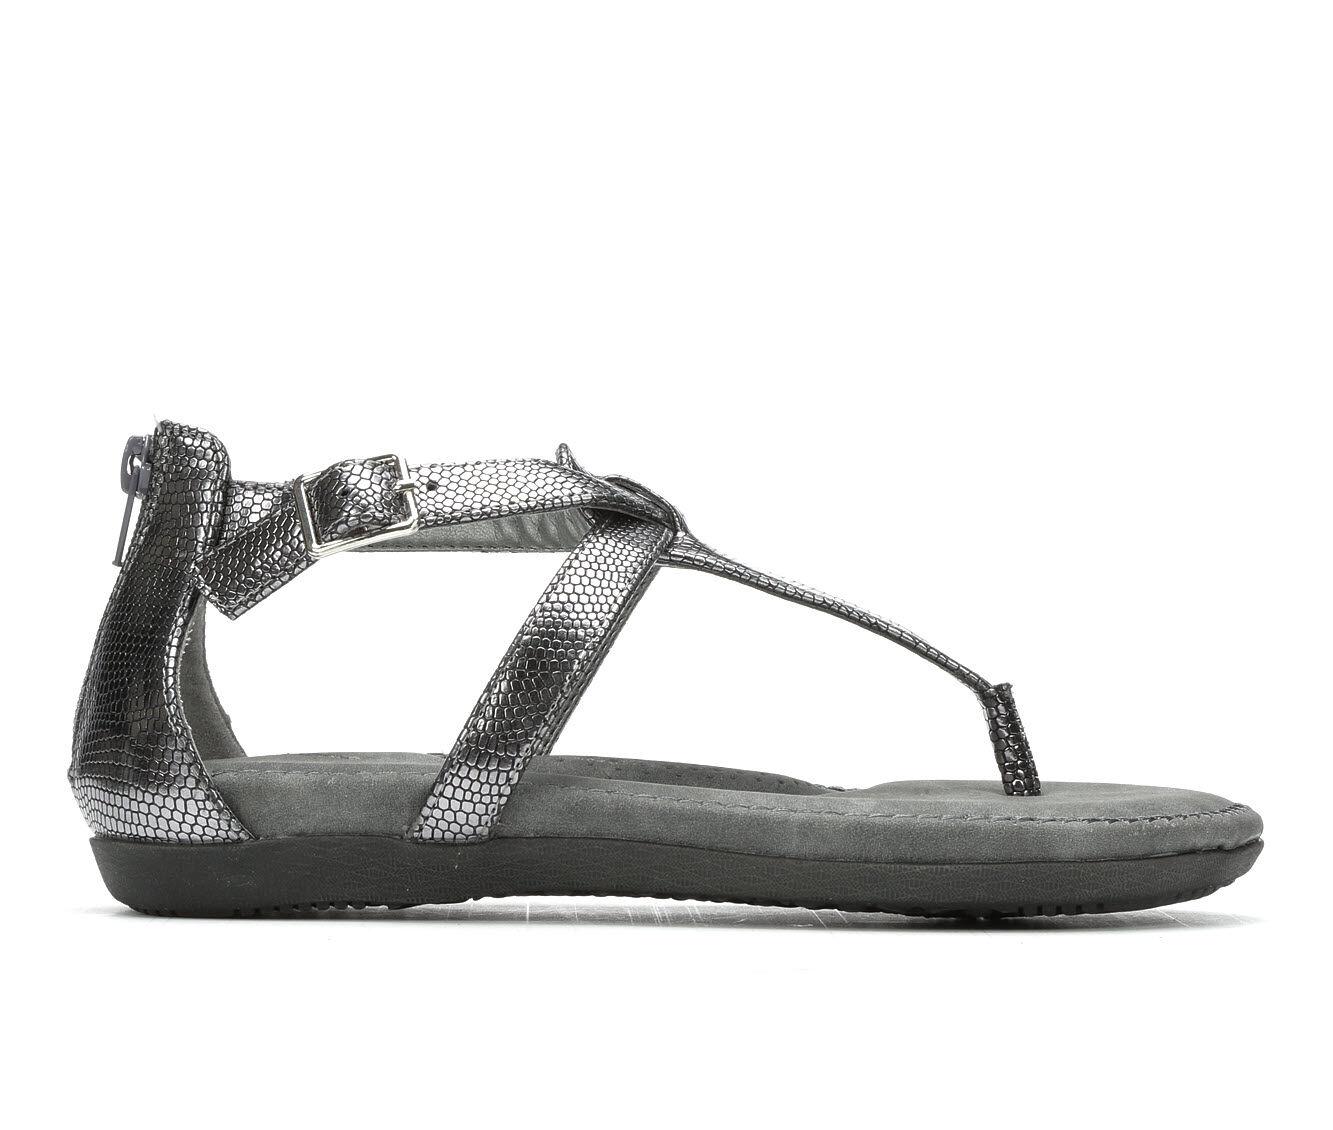 Price Reduced Women's Volatile Xaar Sandals Pewter